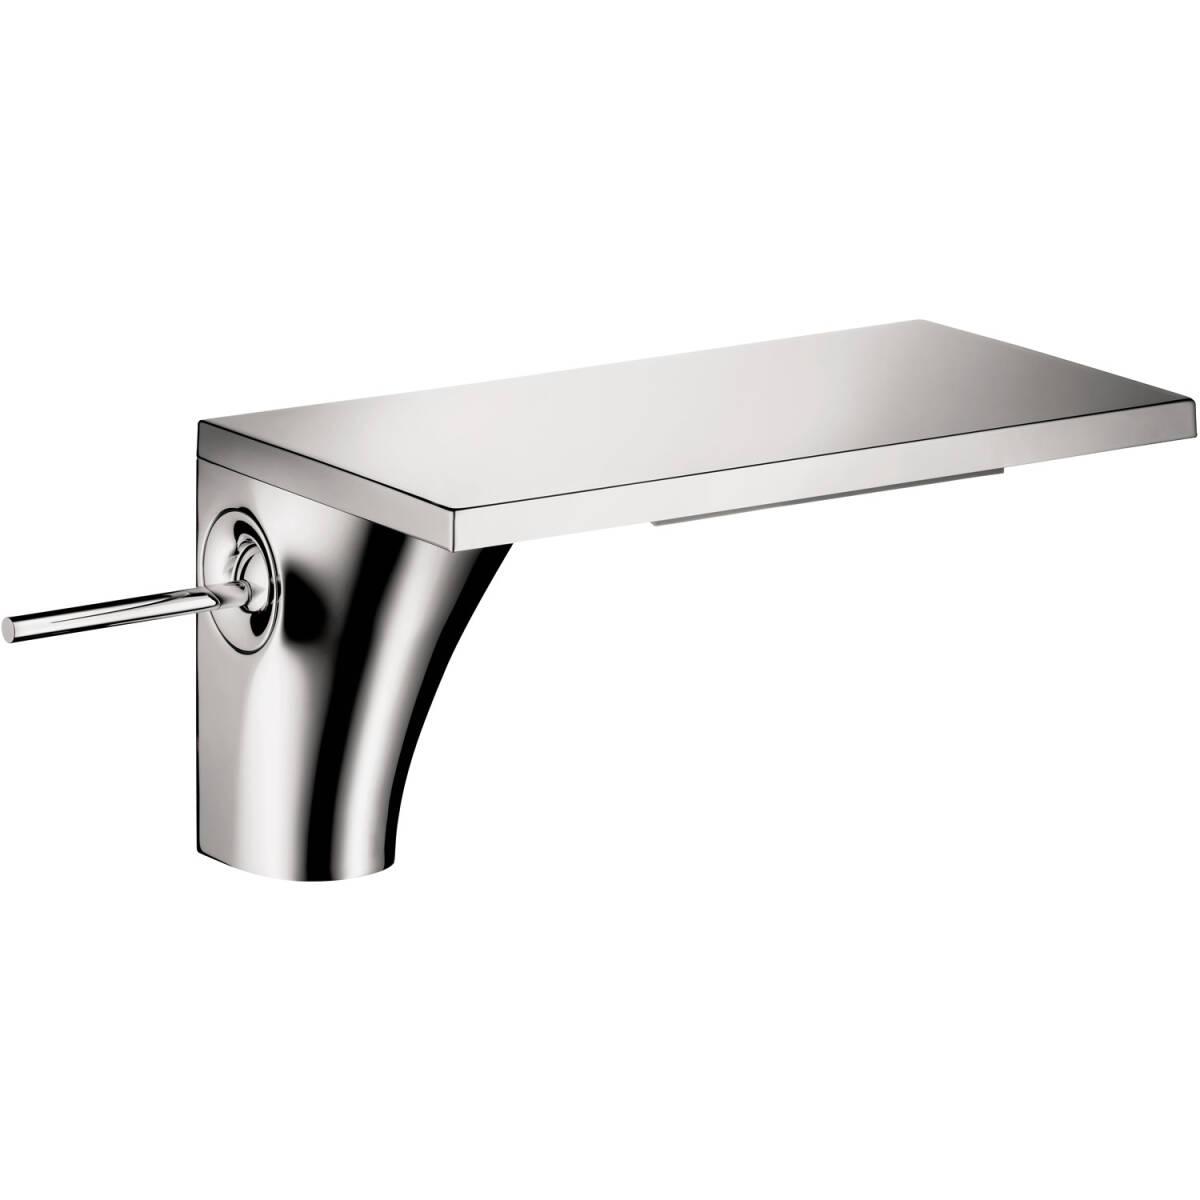 Single lever basin mixer 110 with waste set, Chrome, 18010001